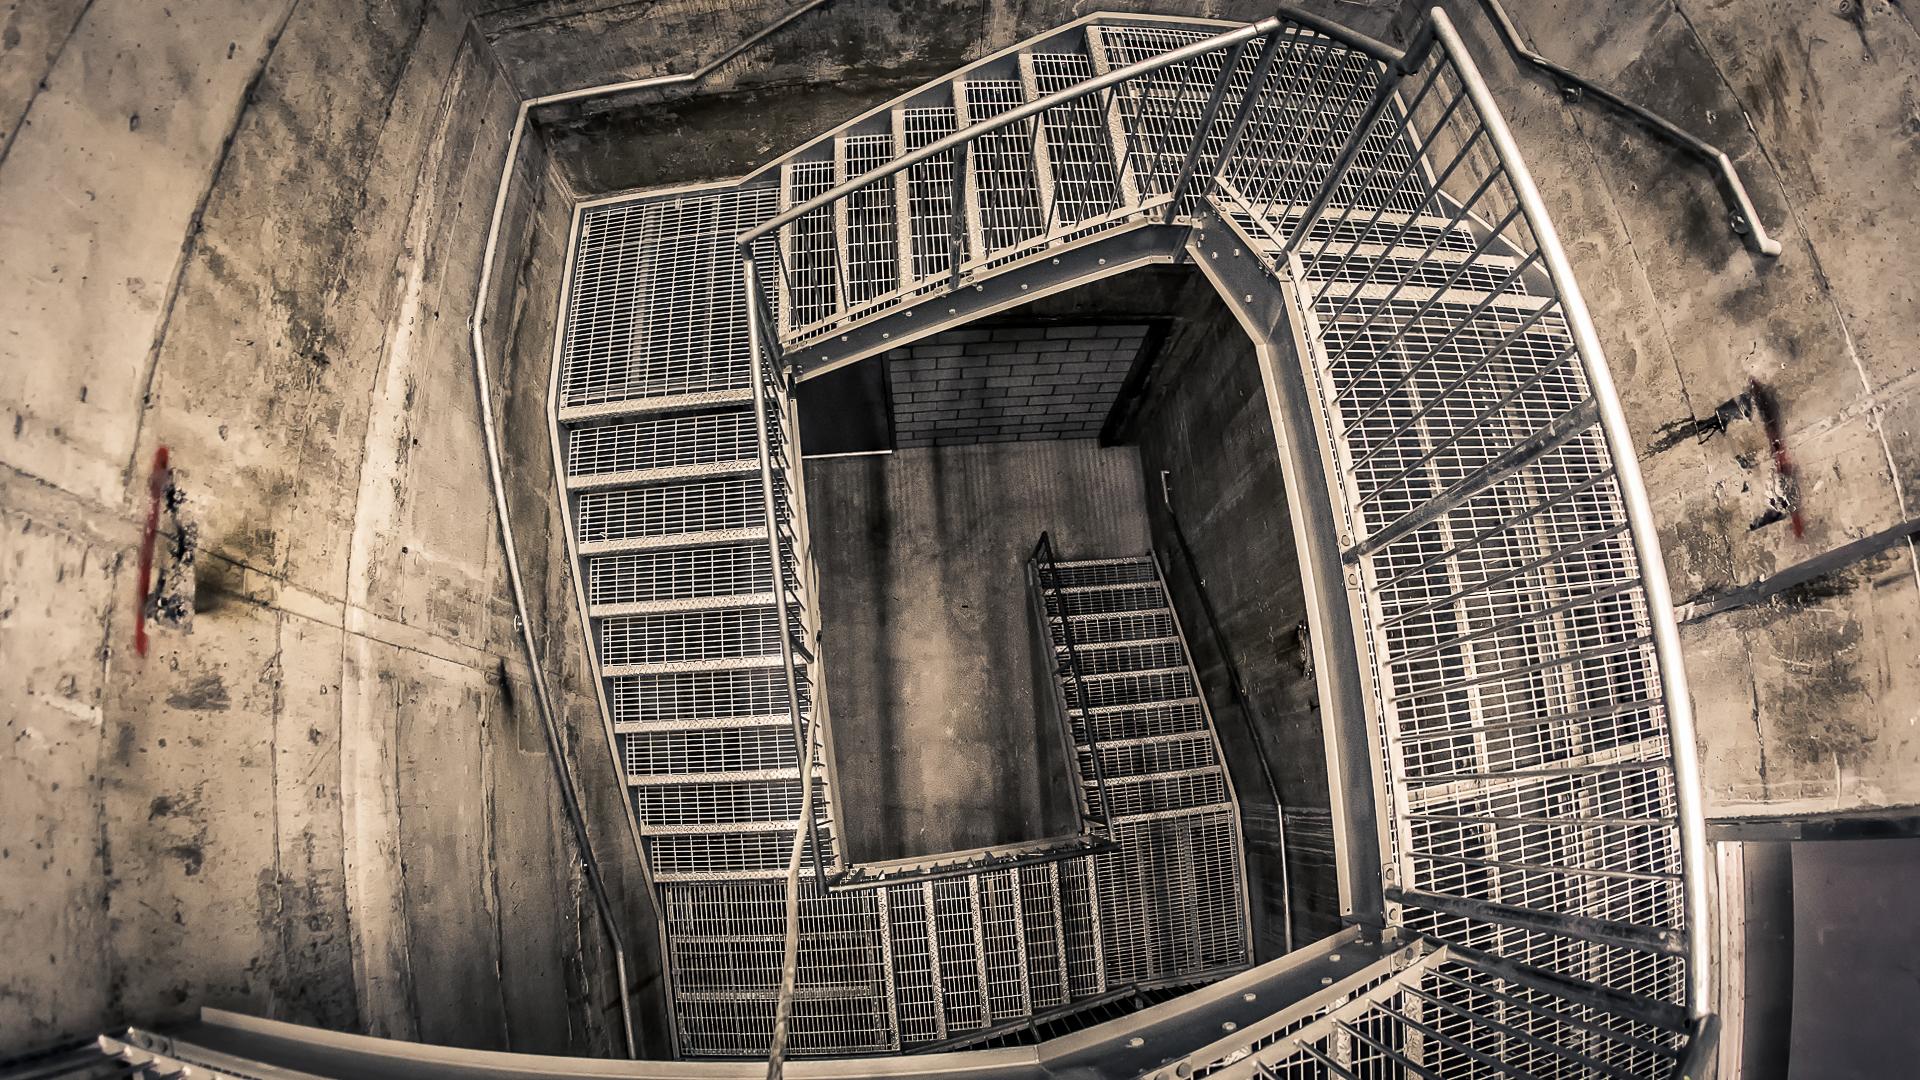 Cage d'escalier lugubre